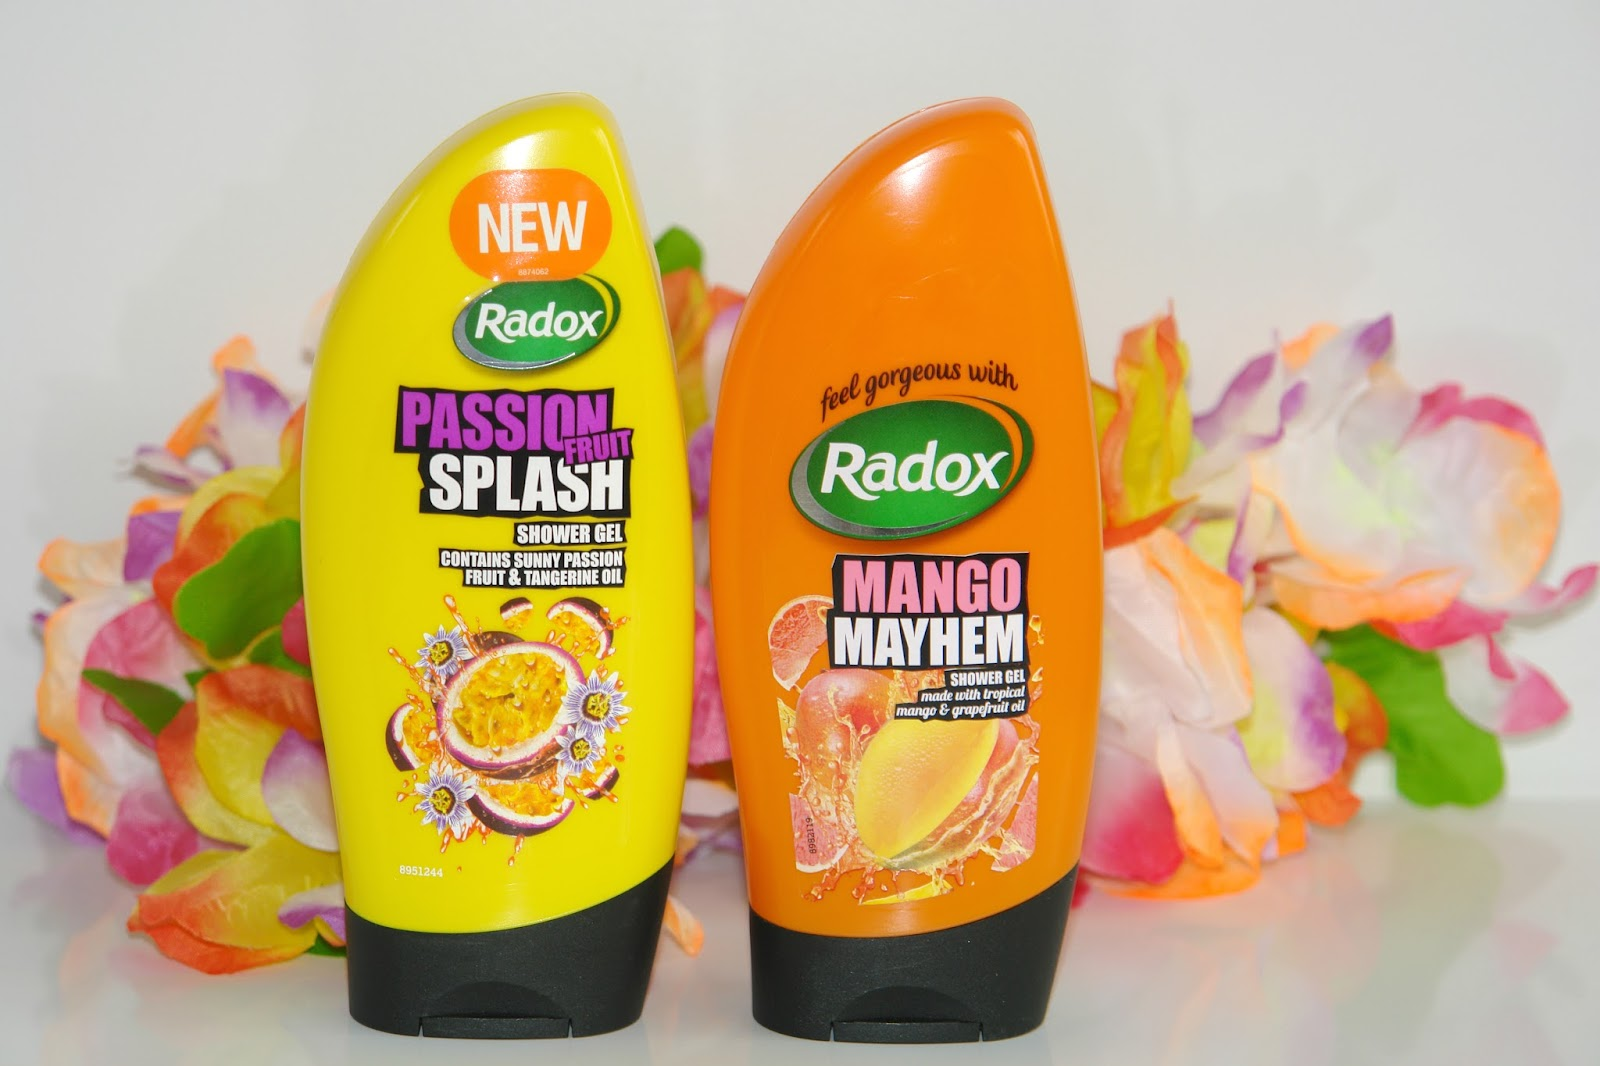 New Radox additions: Passion Fruit Splash and Mango Mayhem, shower gel,